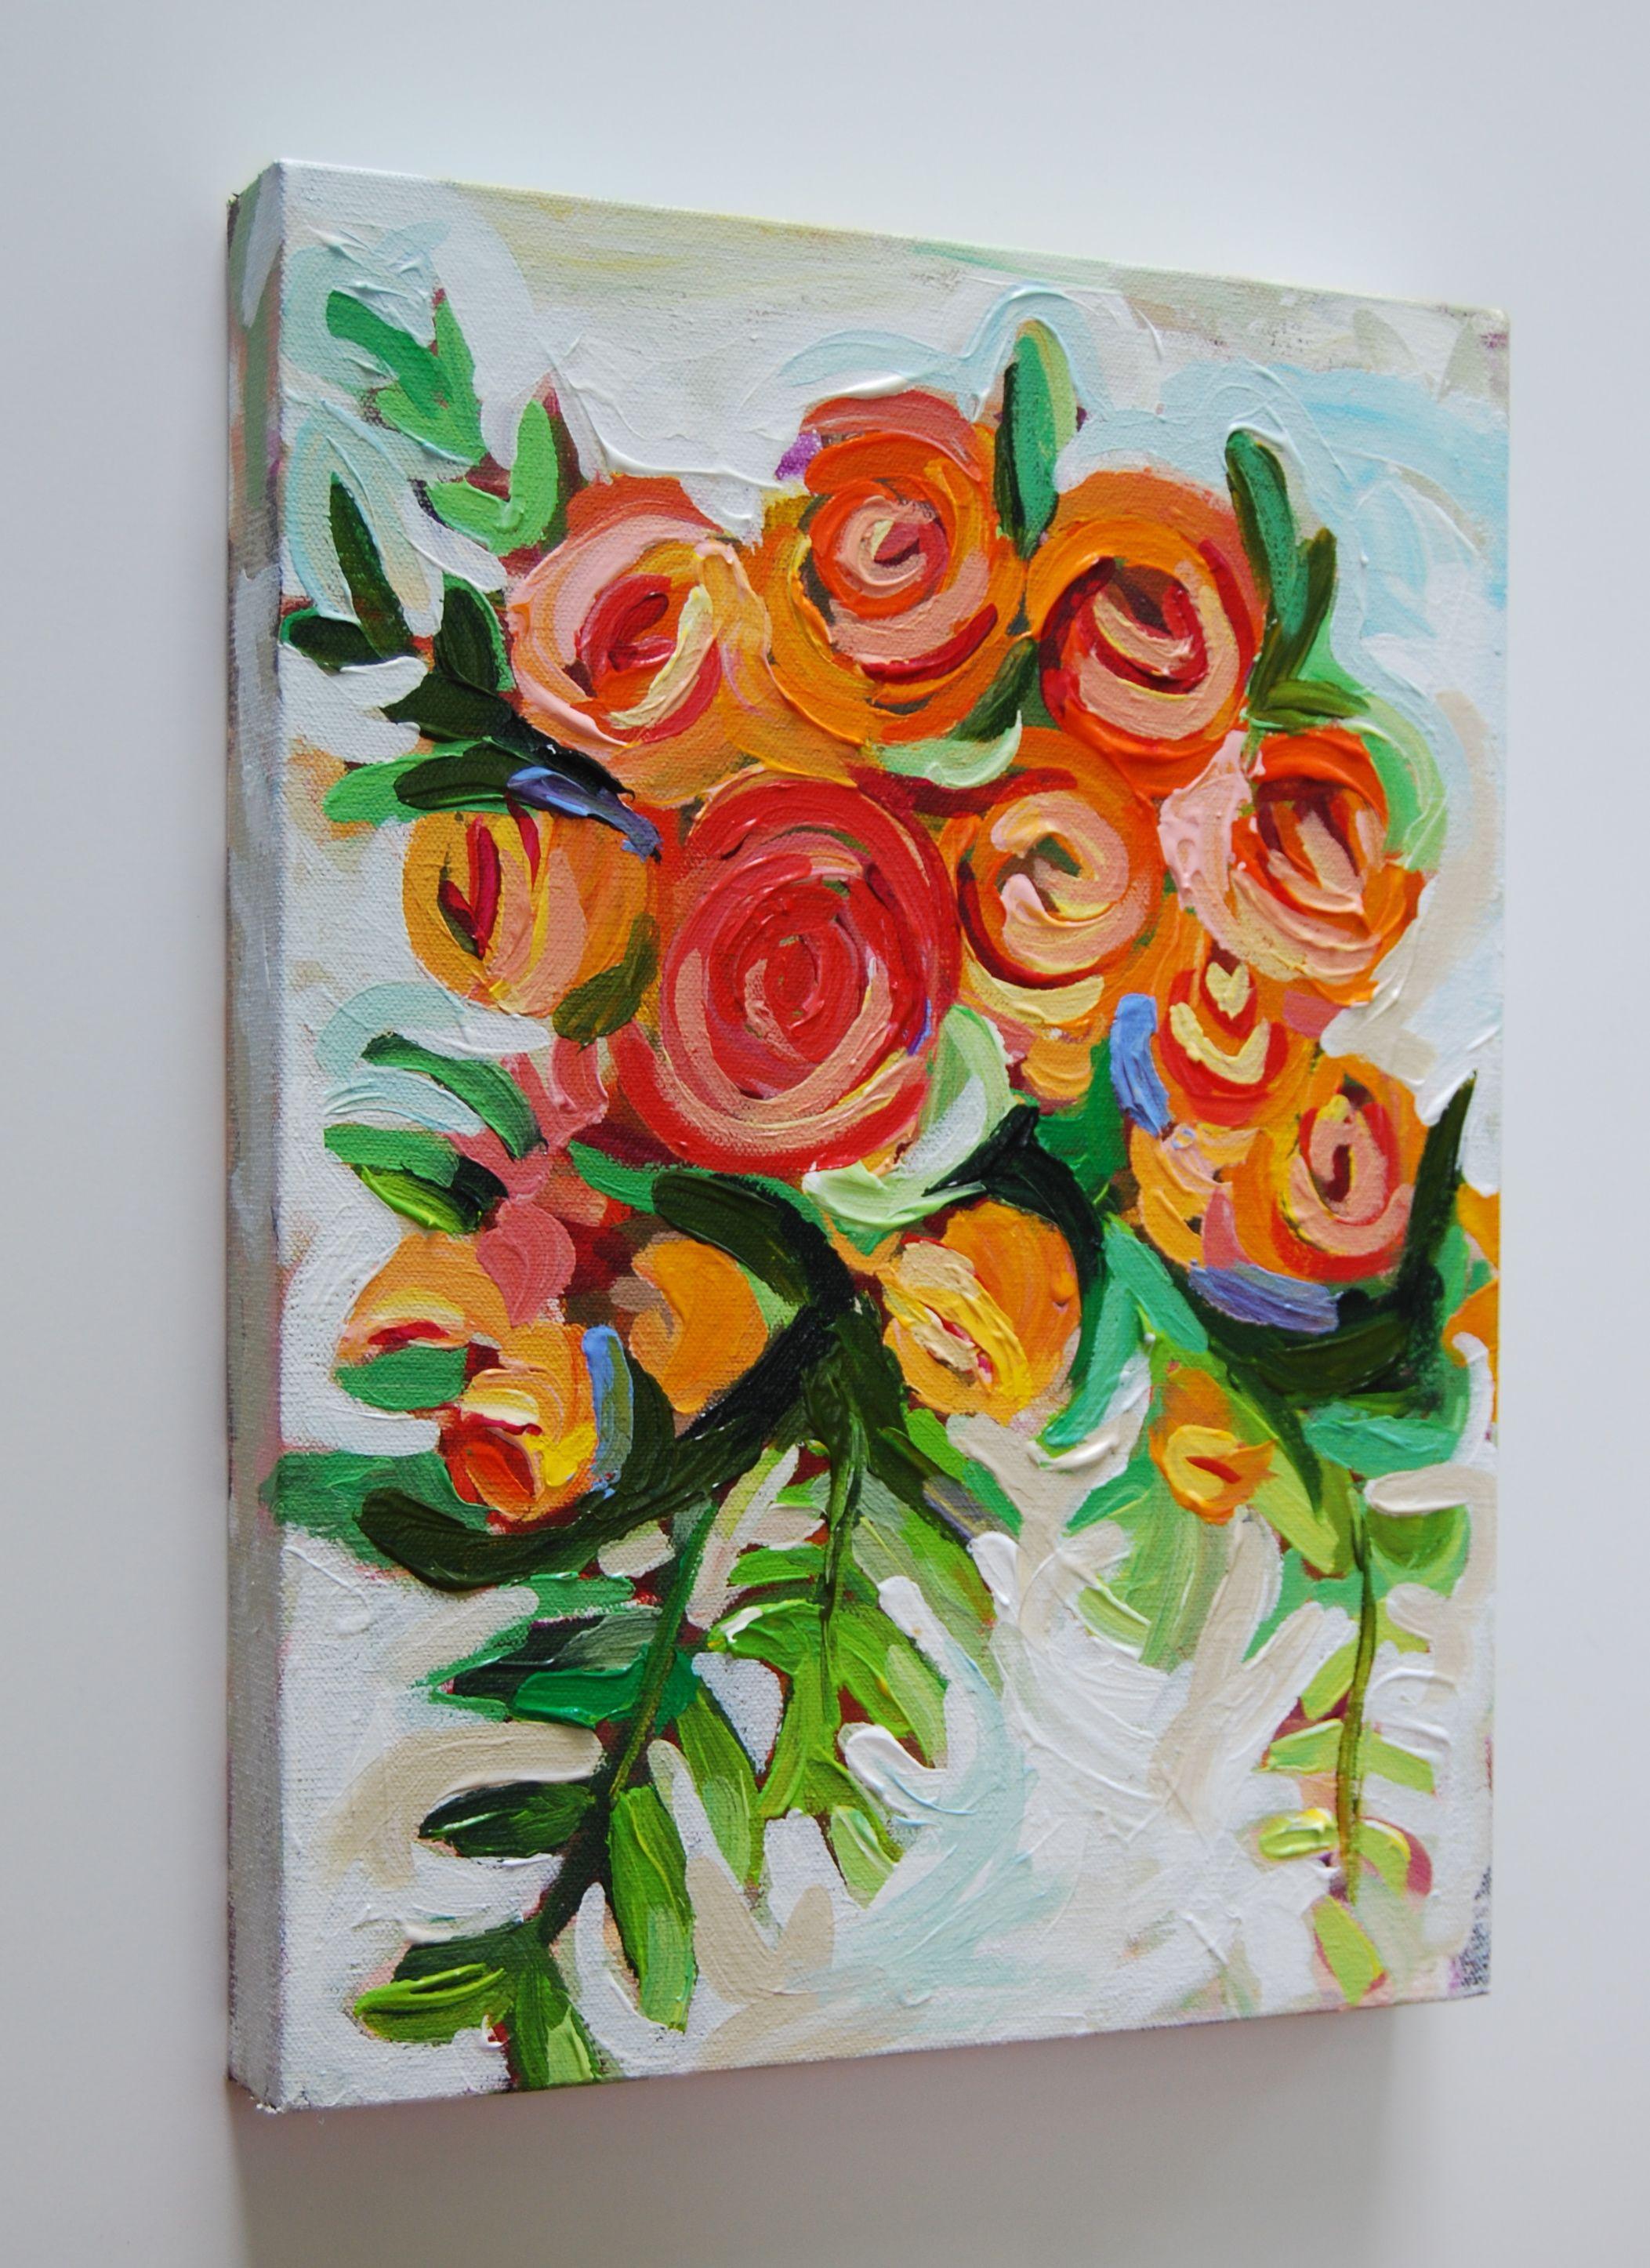 Katherine miller 11x14 acrylic on canvas malen malerei acryl malen und acryl - Leinwand vorlagen ...